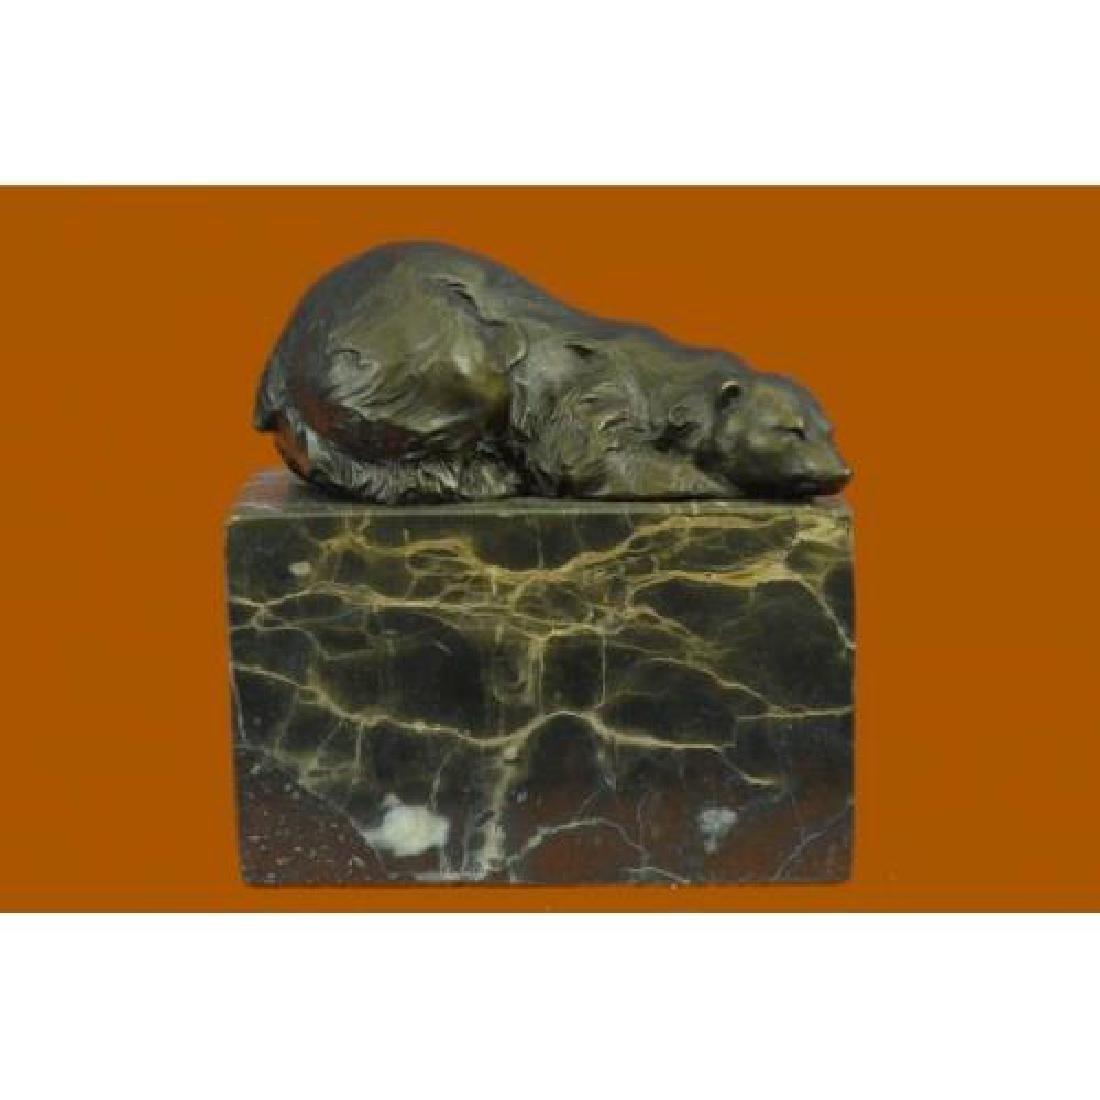 Polar Bear Bronze Sculpture on Marble Base Sculpture